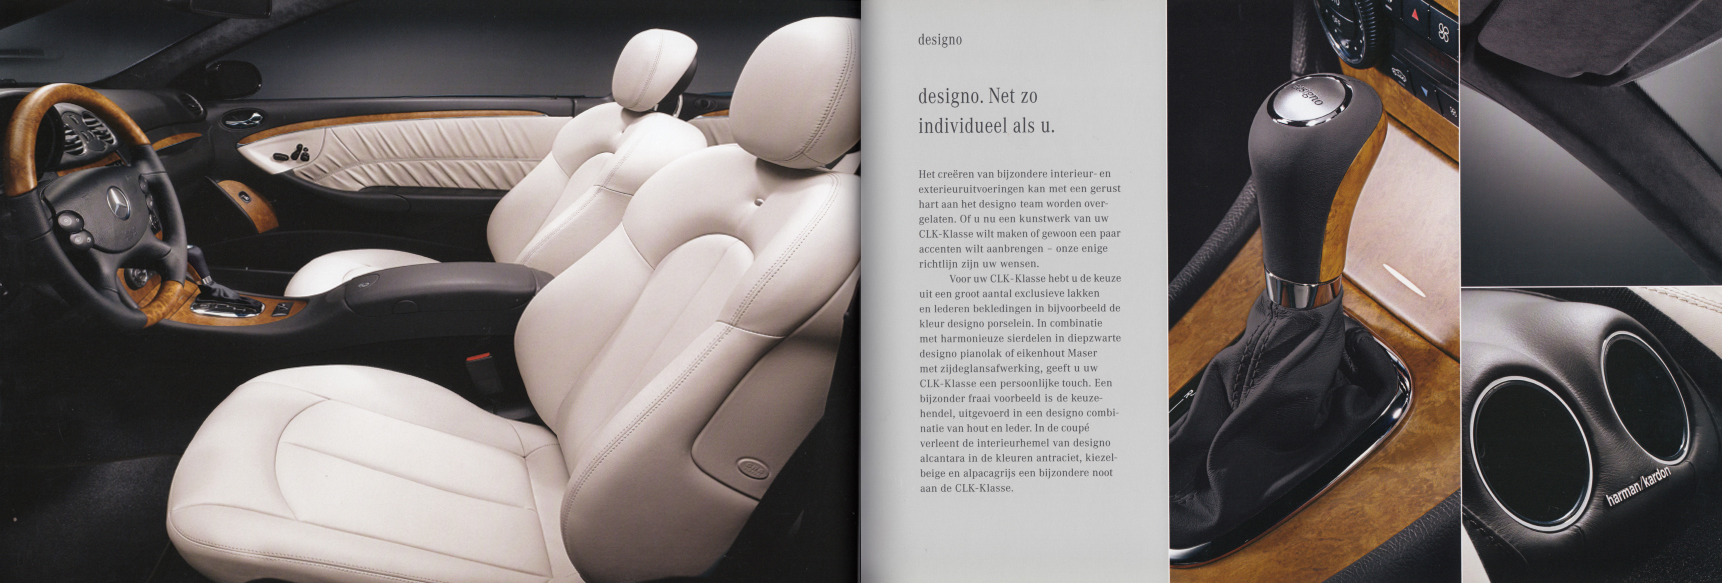 (A/C209): Catálogo 2006 - neerlandês 026